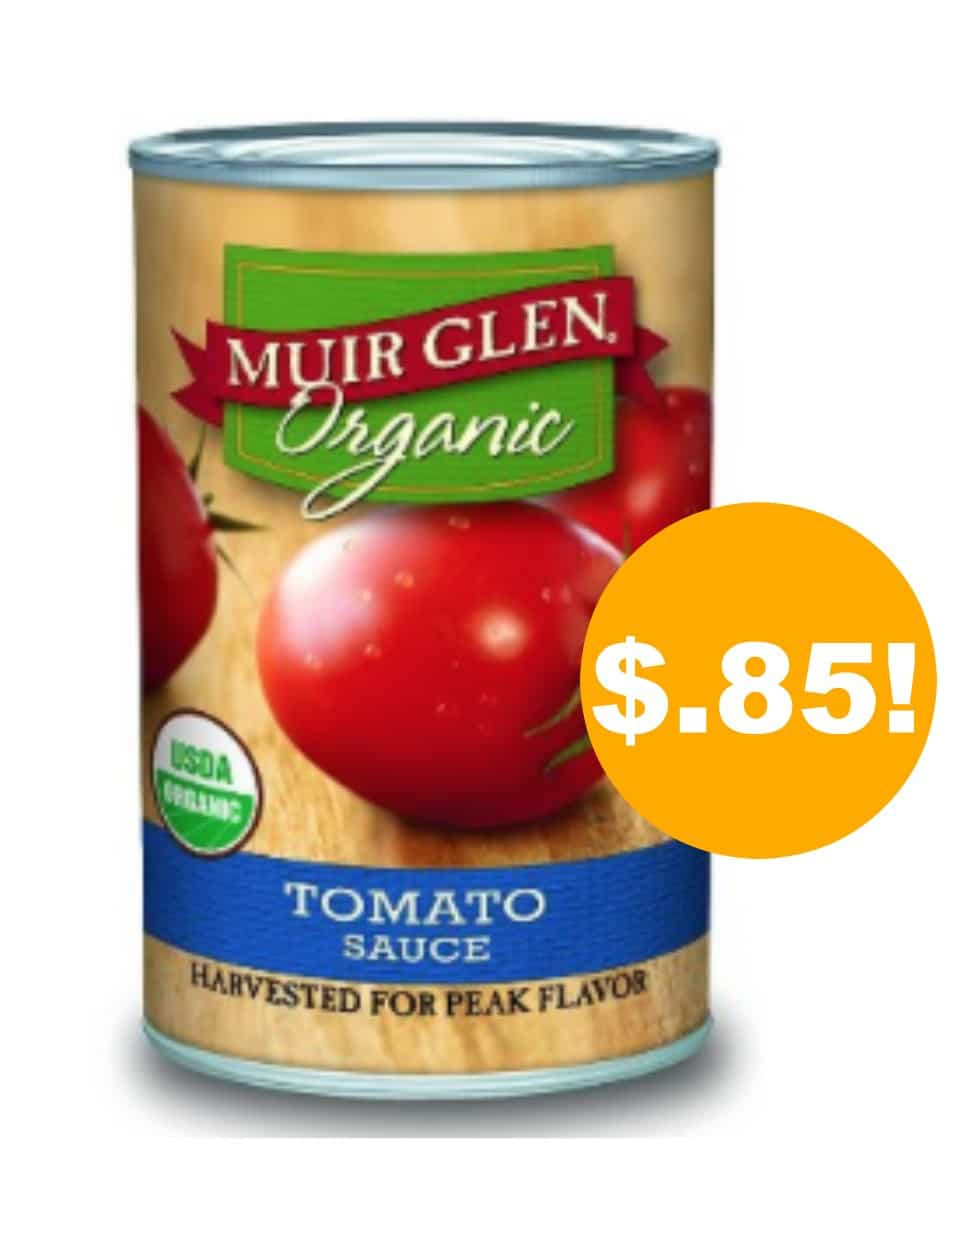 Muir Glen Tomato Sauce  Muir Glen Organic Tomato Sauce 15 oz as low as $ 85 a